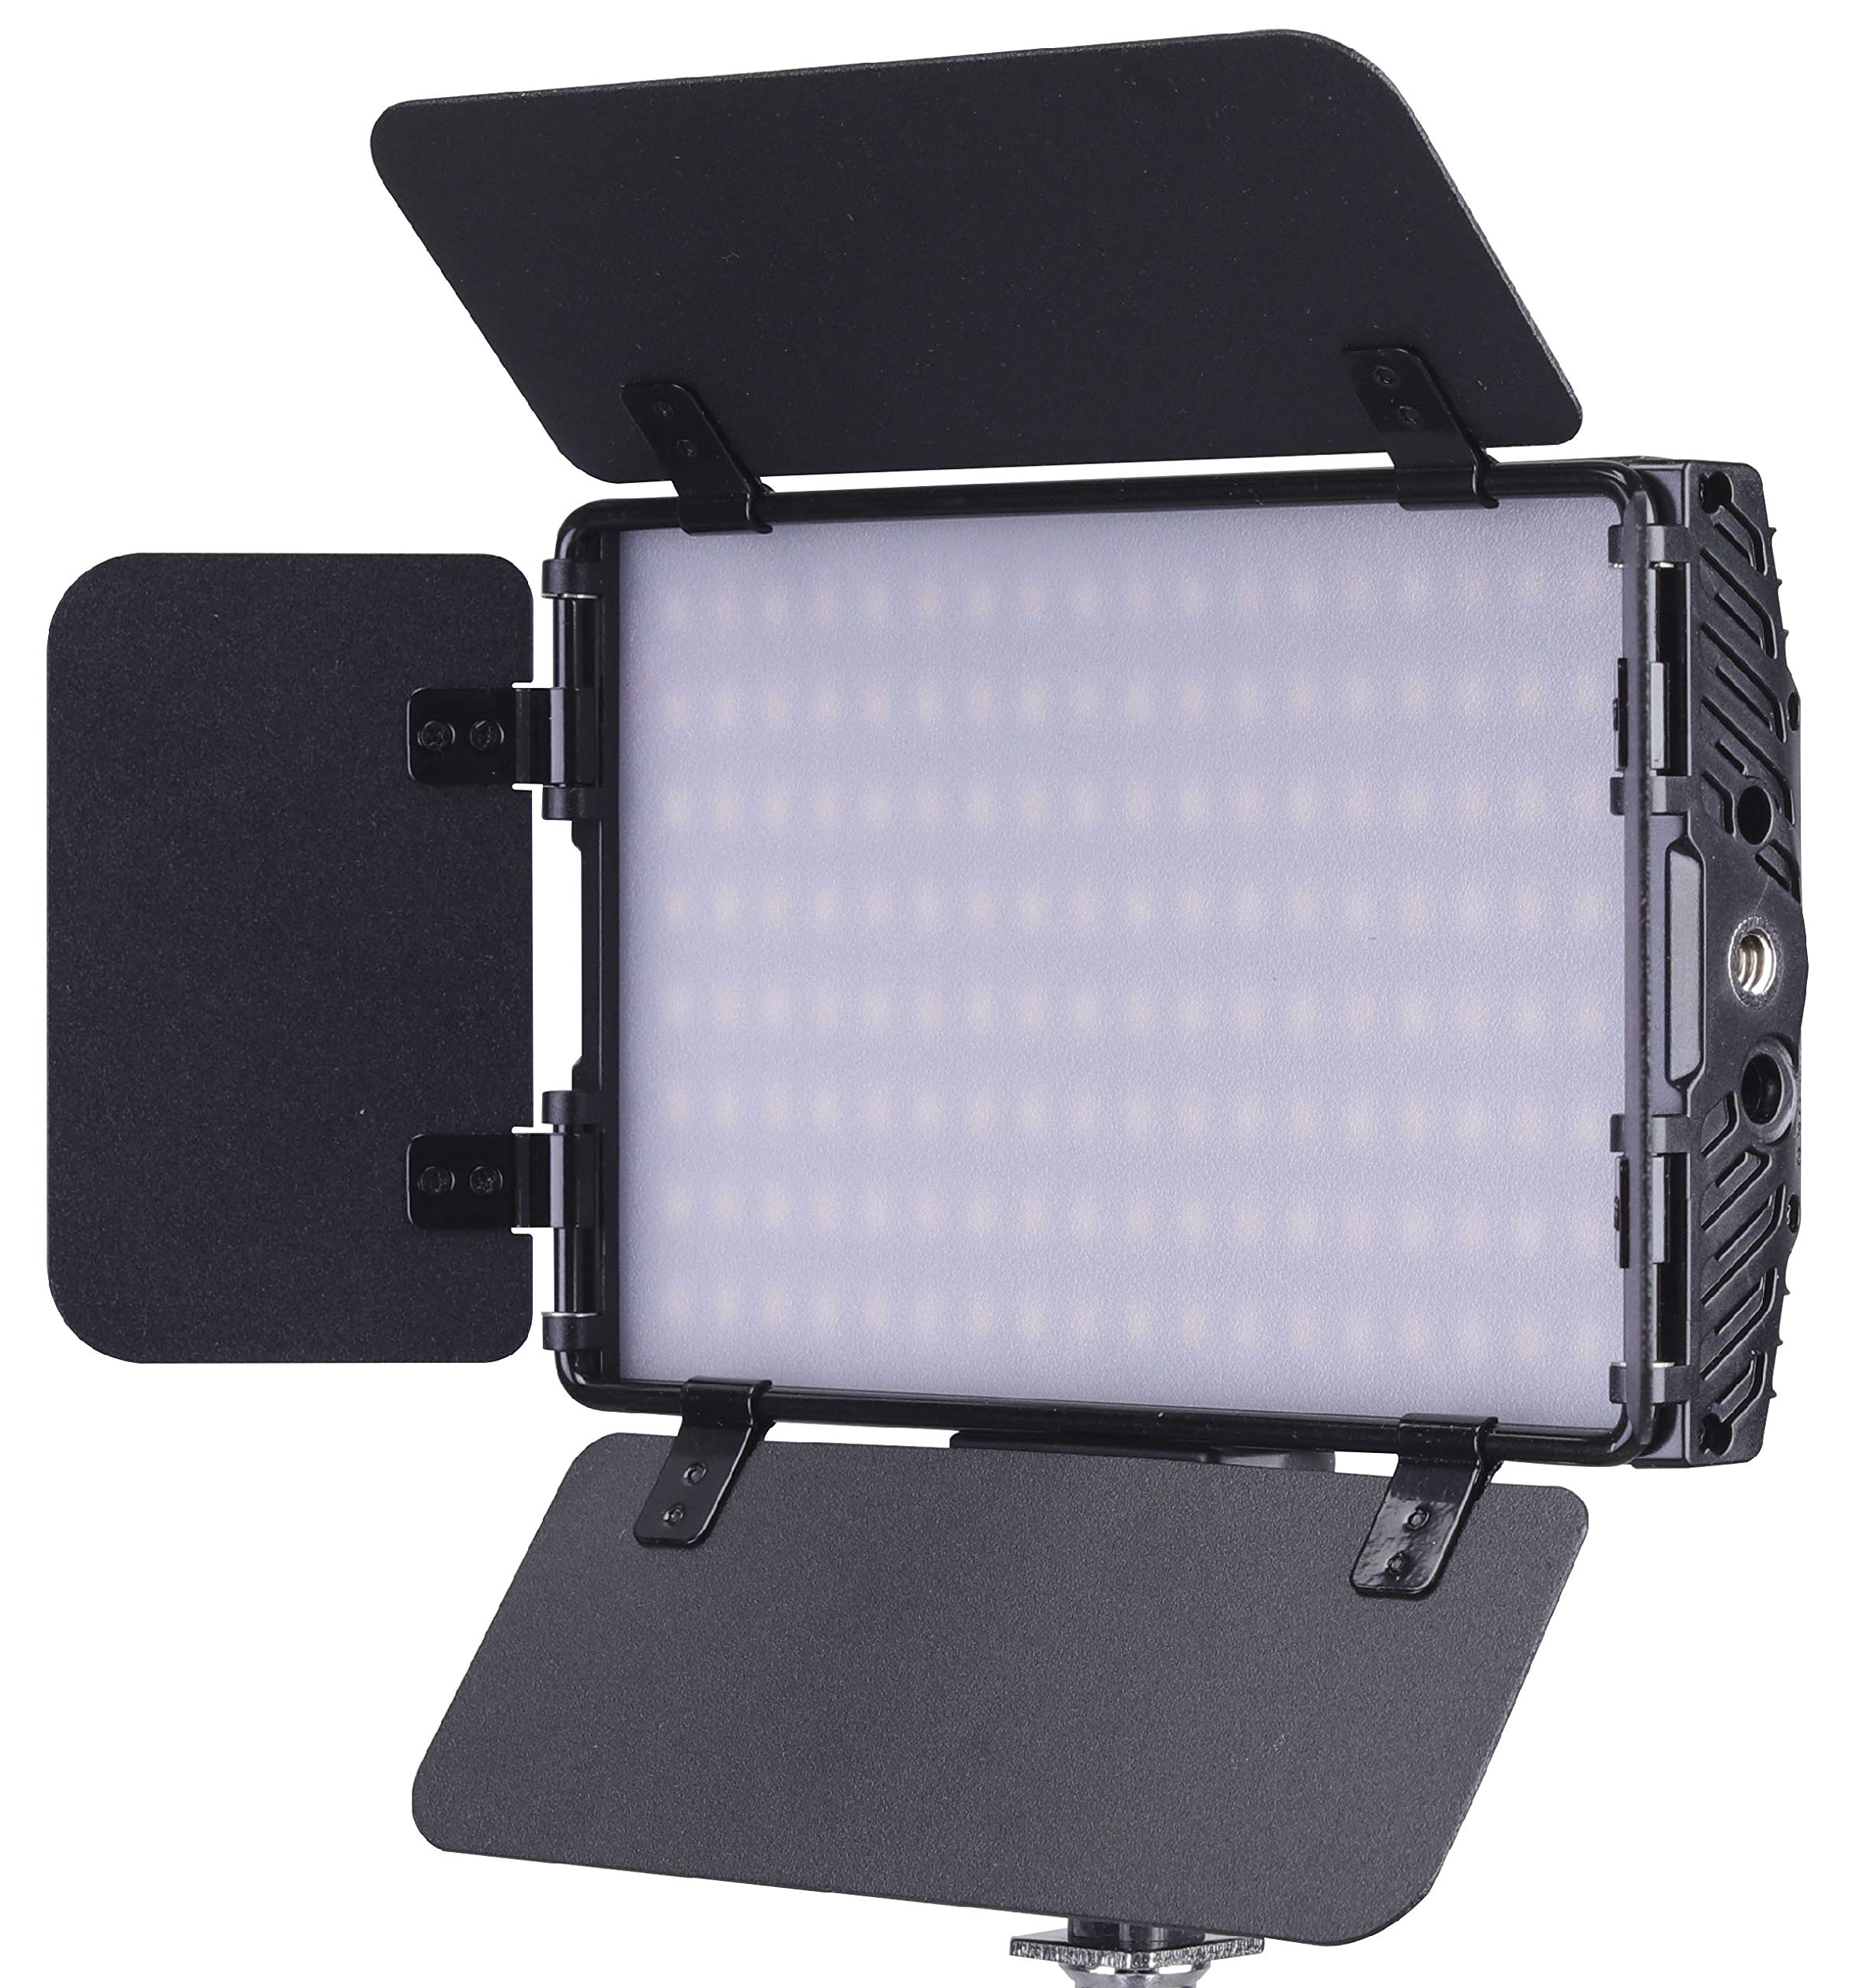 Phottix Kali150 Studio LED (PH81441)